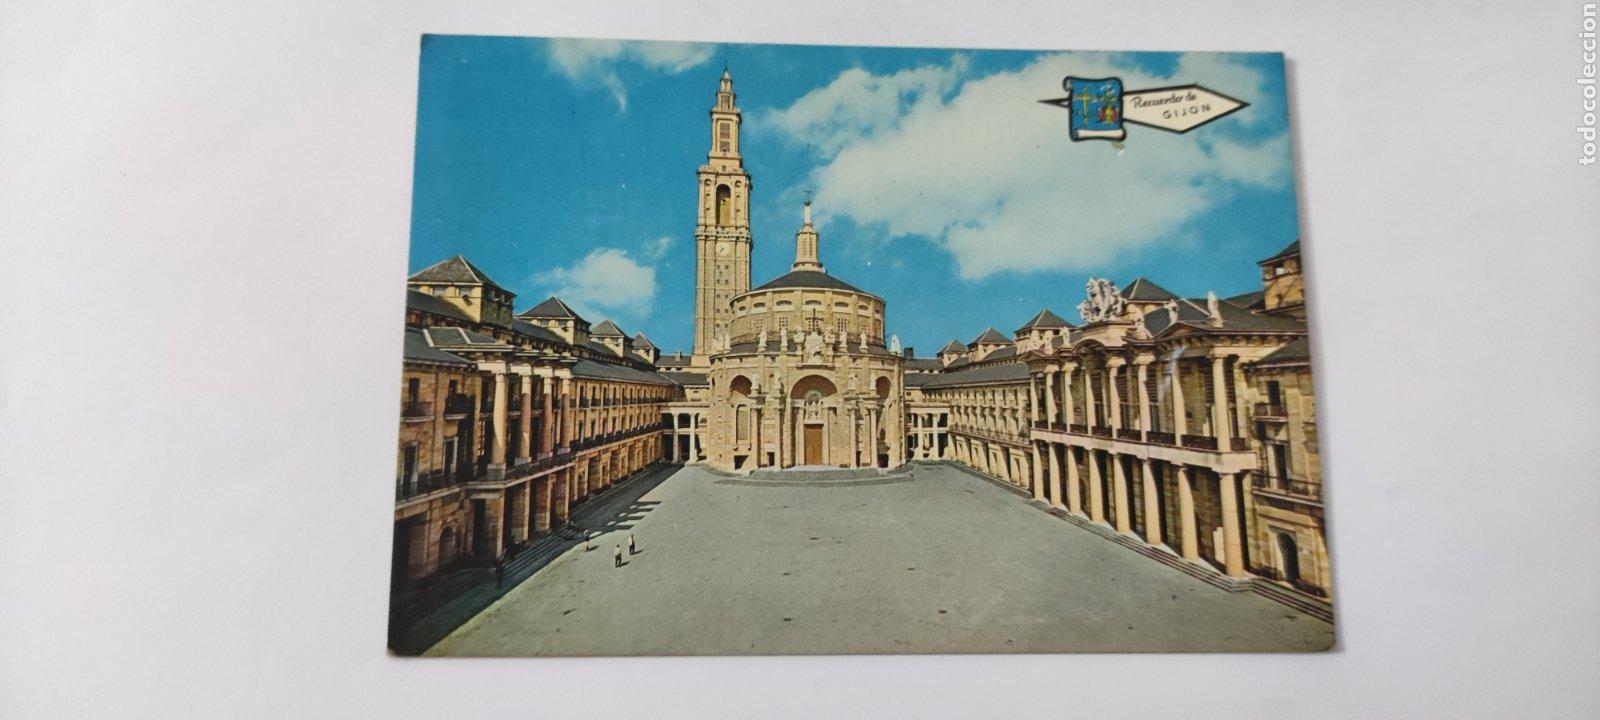 POSTAL 16056 GIJÓN. UNIVERSIDAD LABORAL. (Postales - España - Asturias Moderna (desde 1.940))